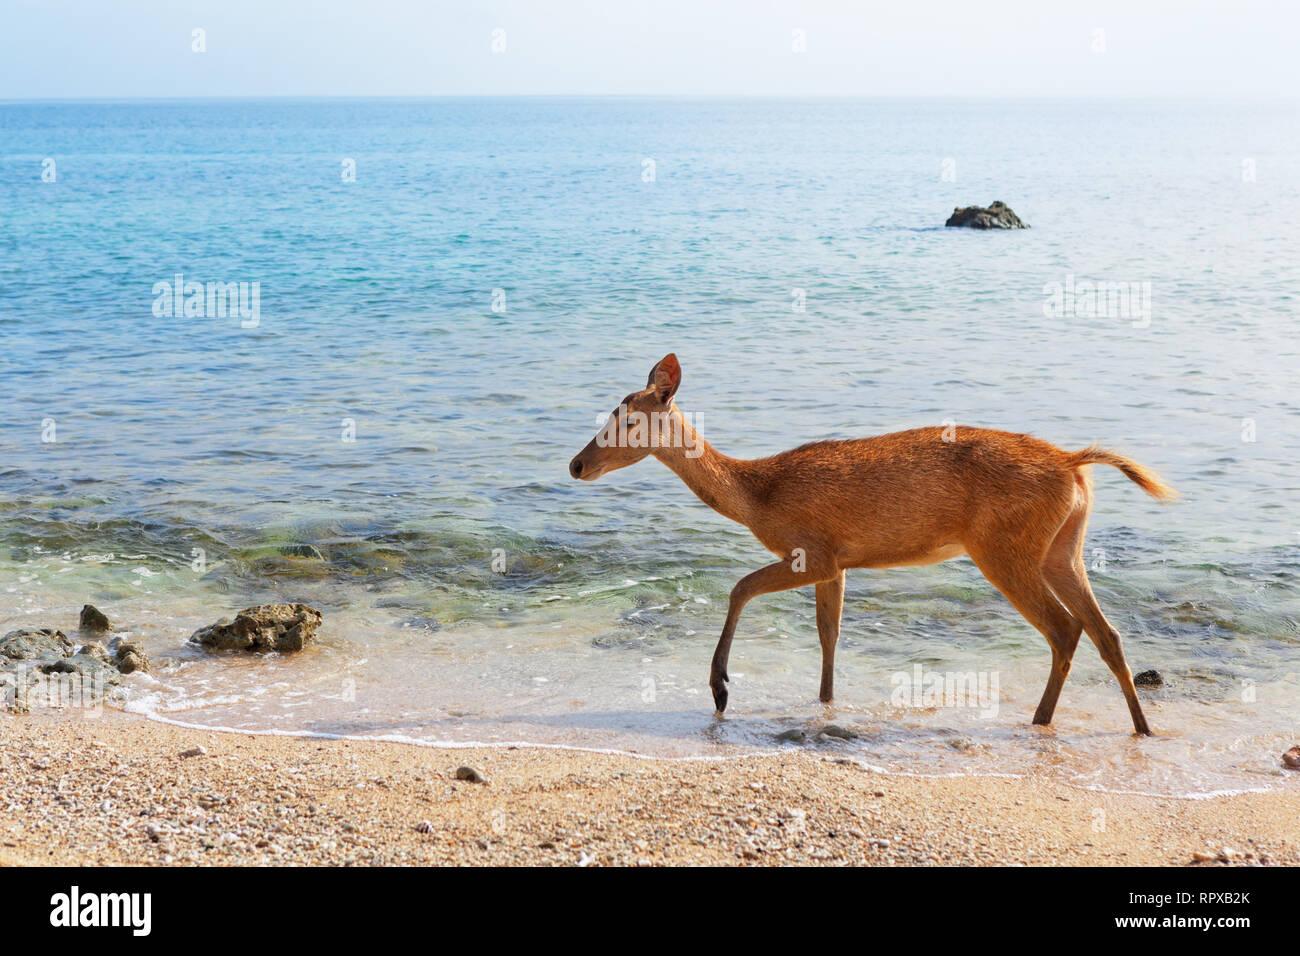 Fawn of Javan Rusa on beach of Bali west national park and Menjangan ( deer island ) - popular travel destination for scuba diving safari, snorkeling - Stock Image